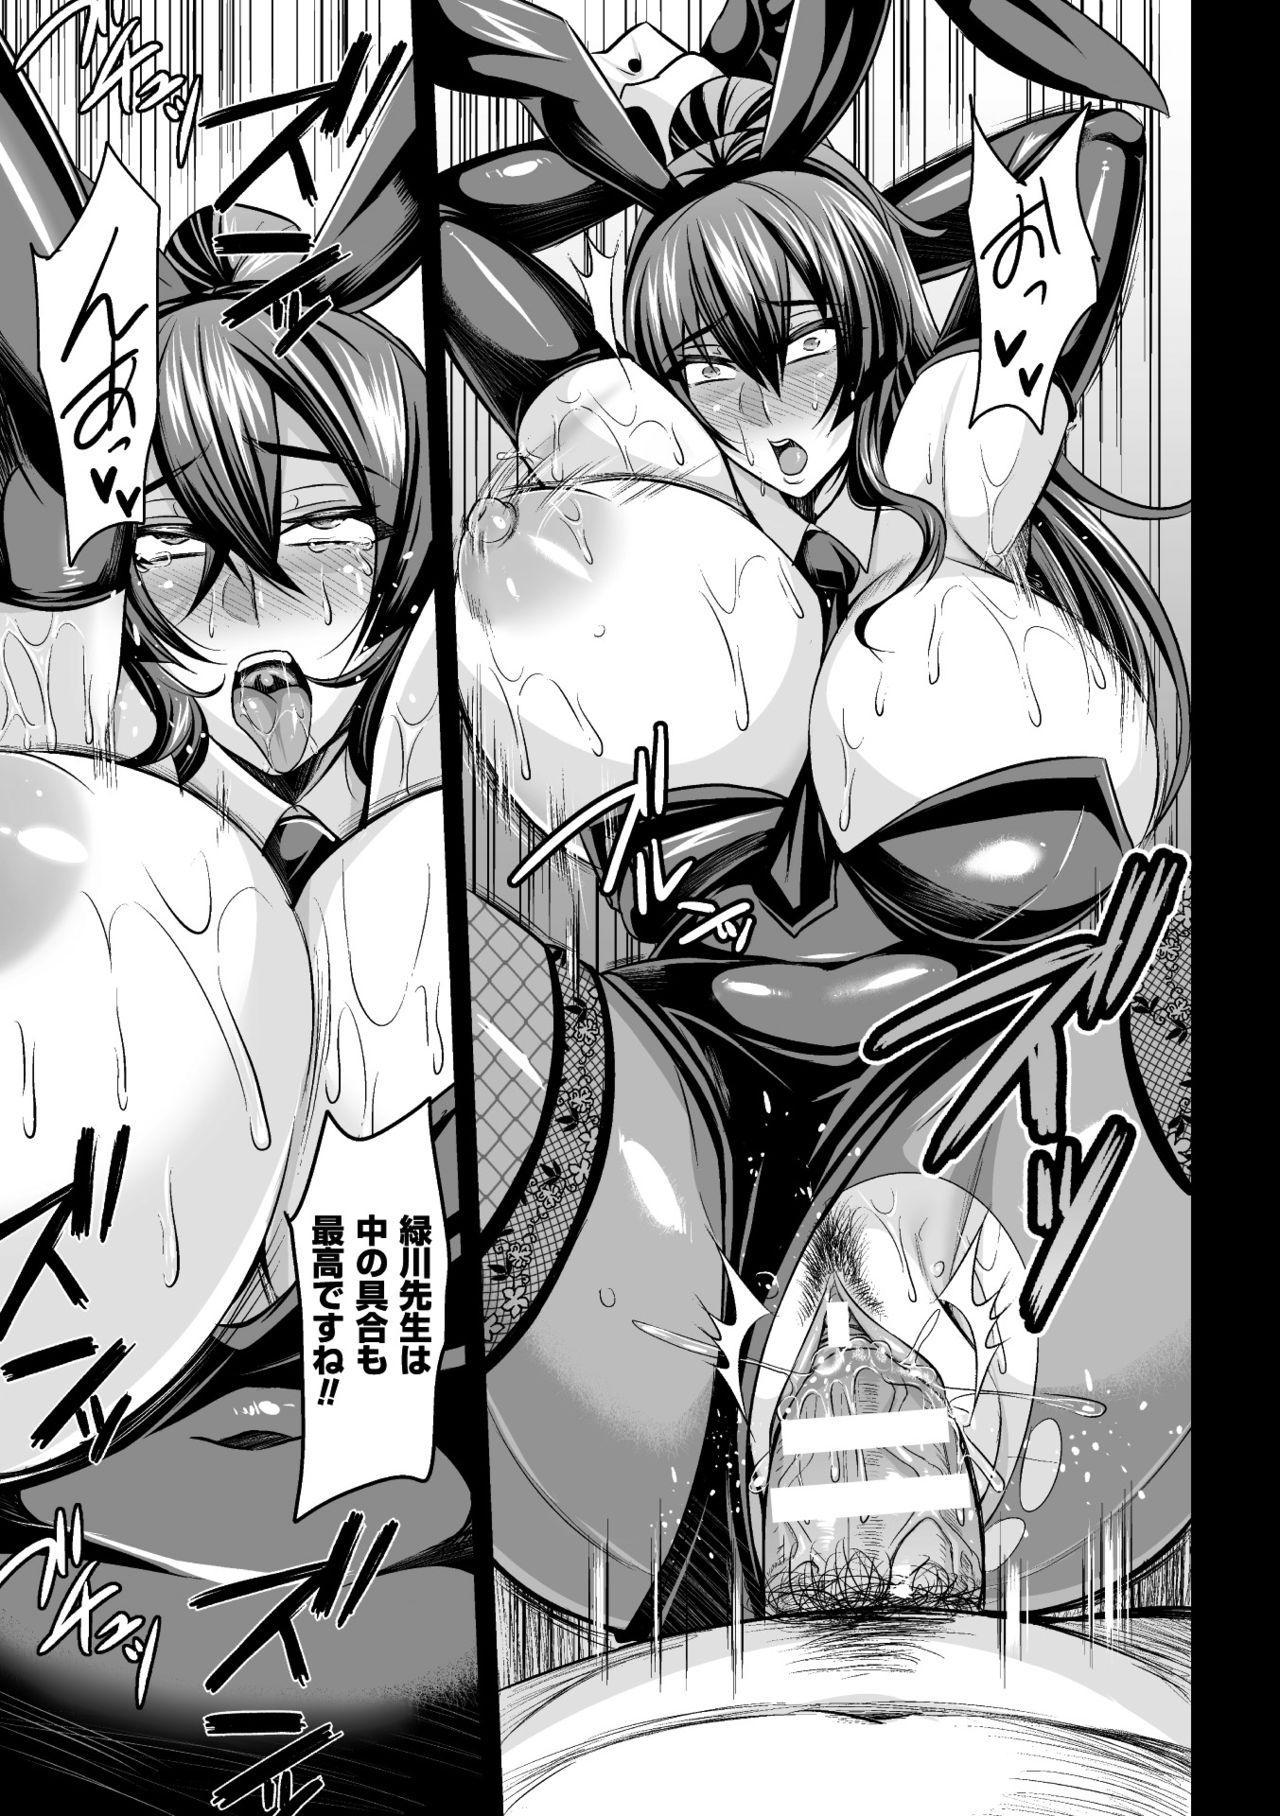 2D Comic Magazine Waki Feti Bunny Girl Vol. 1 42